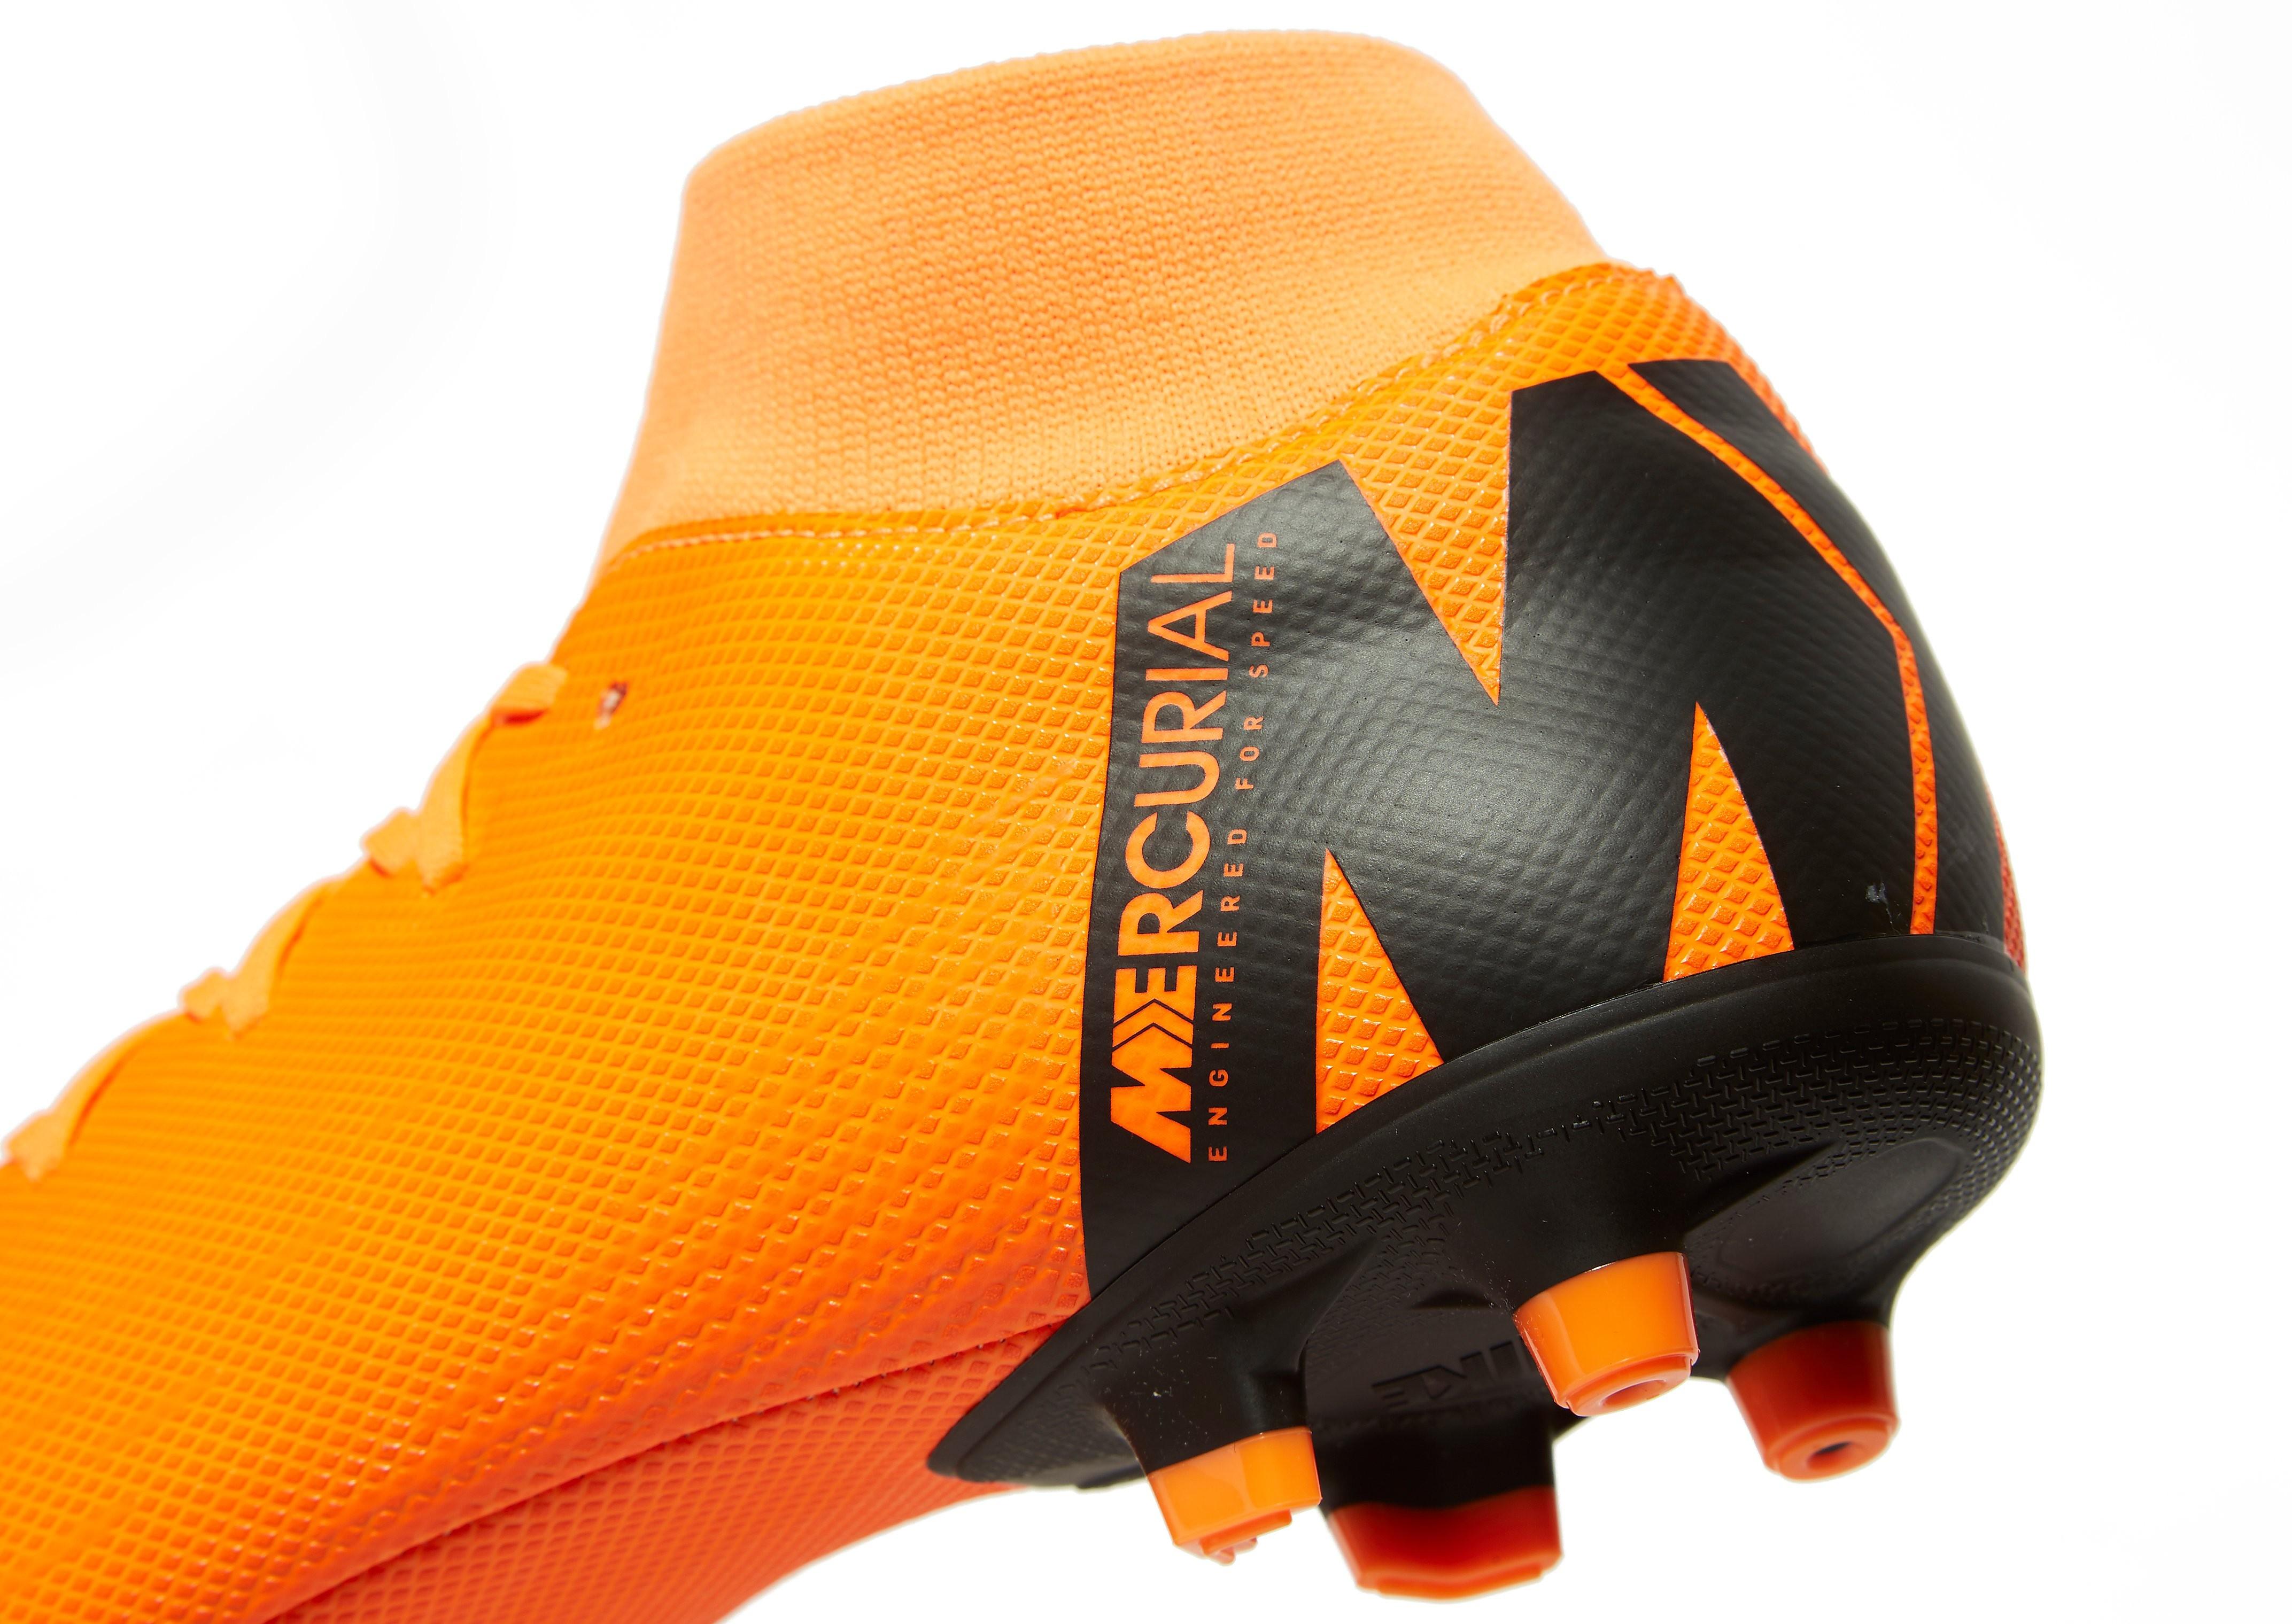 Nike Mercurial 360 Academy Dynamic Fit MG